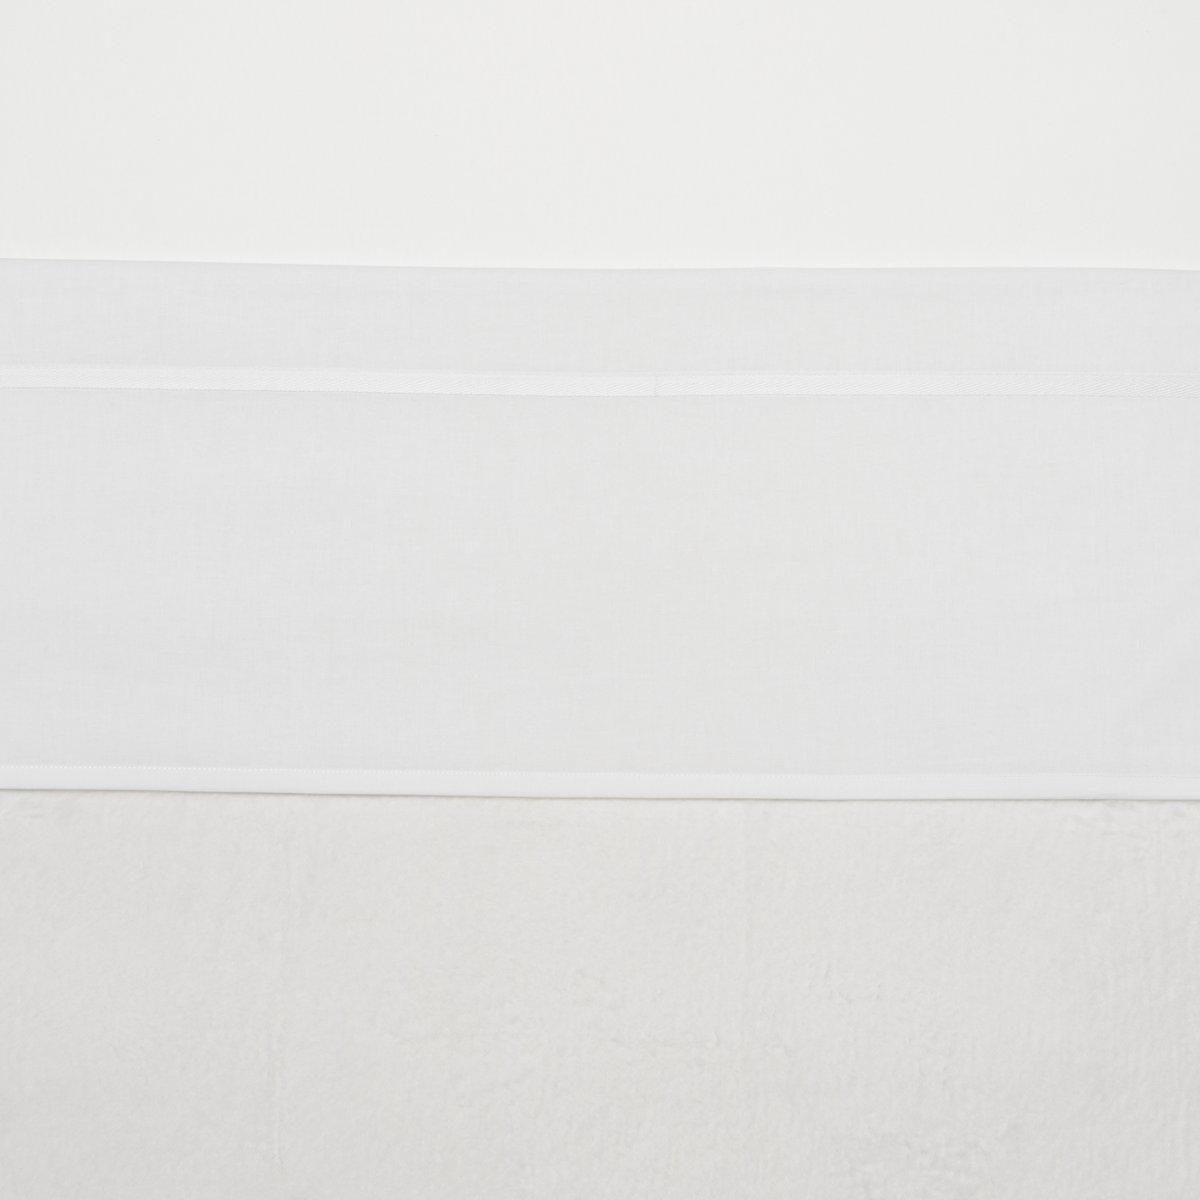 Meyco wieglaken wit met bies 75 x 100 cm - Wit